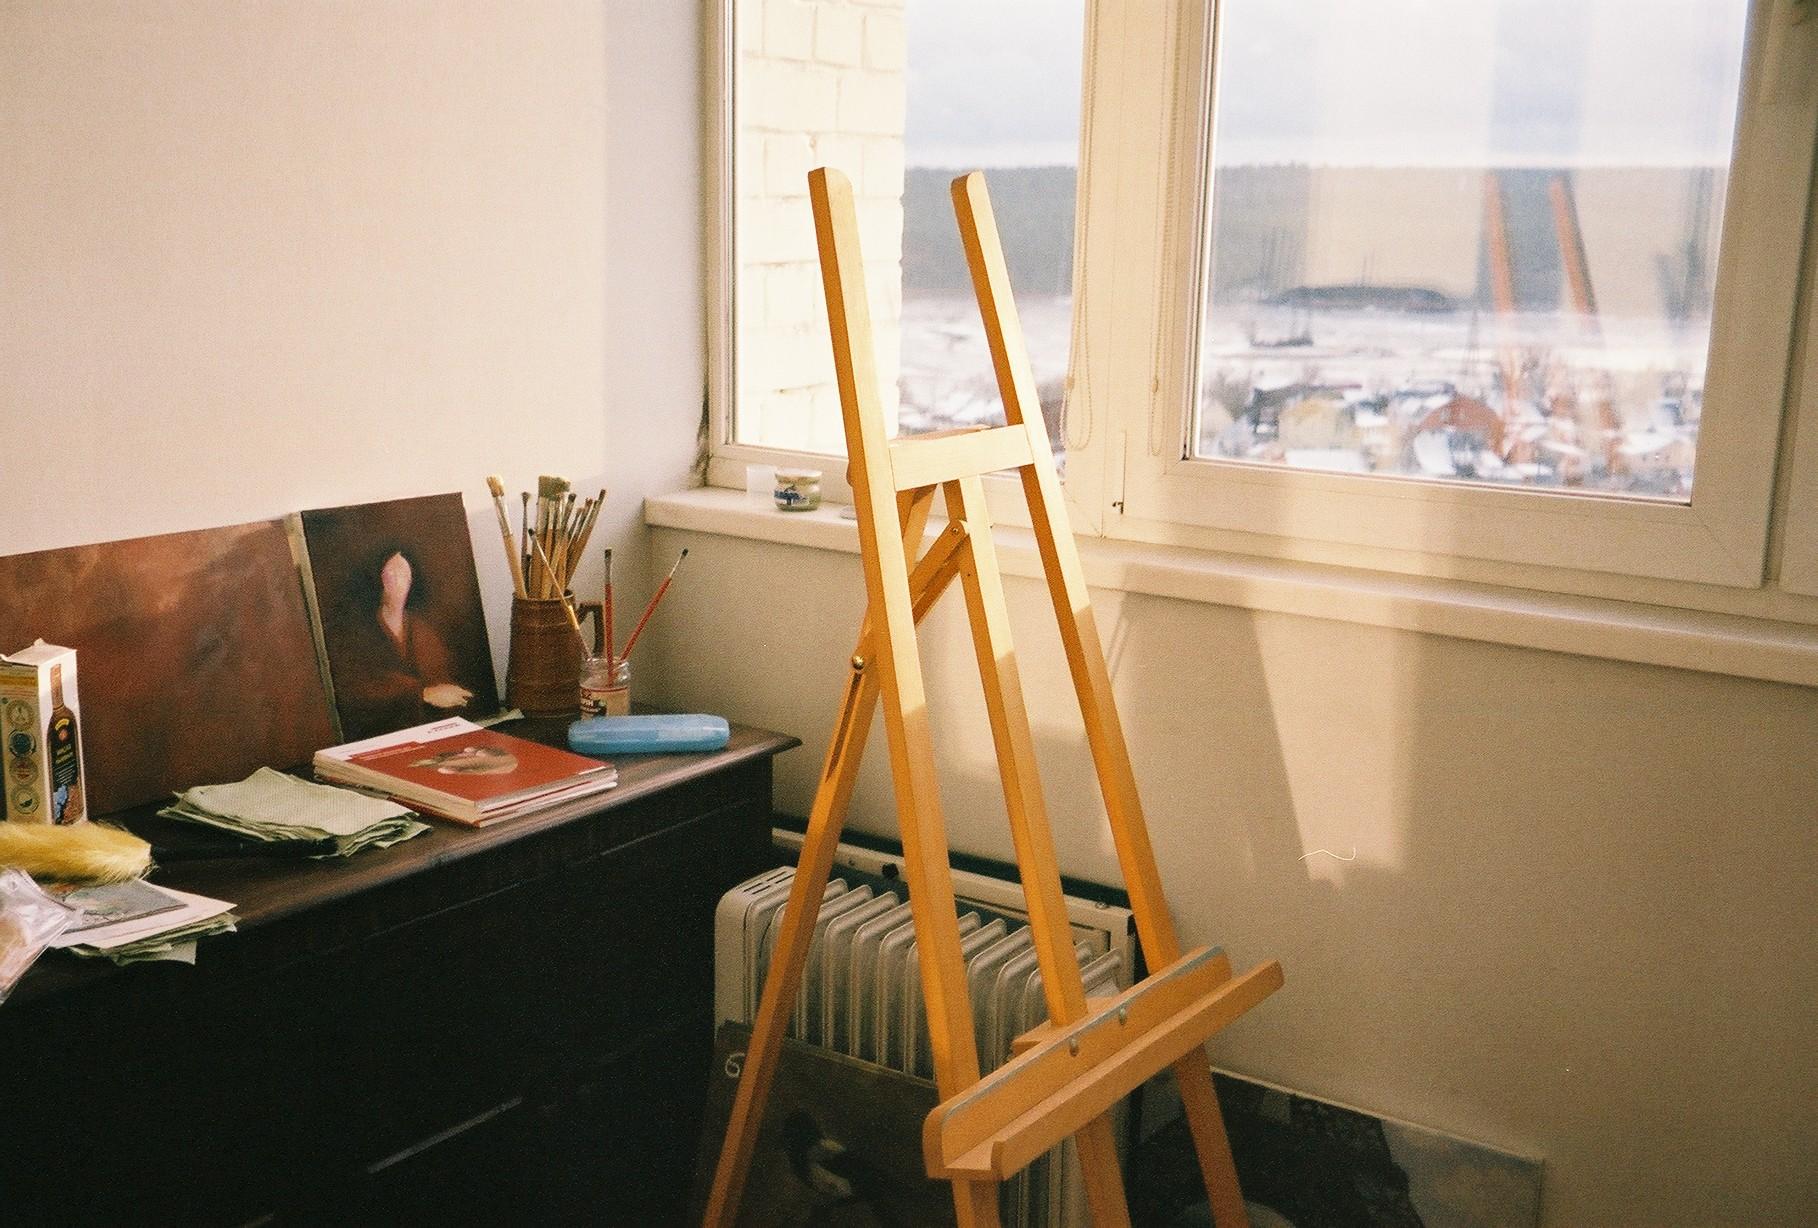 Studio | Olympus Superzoom 80g | Anna Sagal